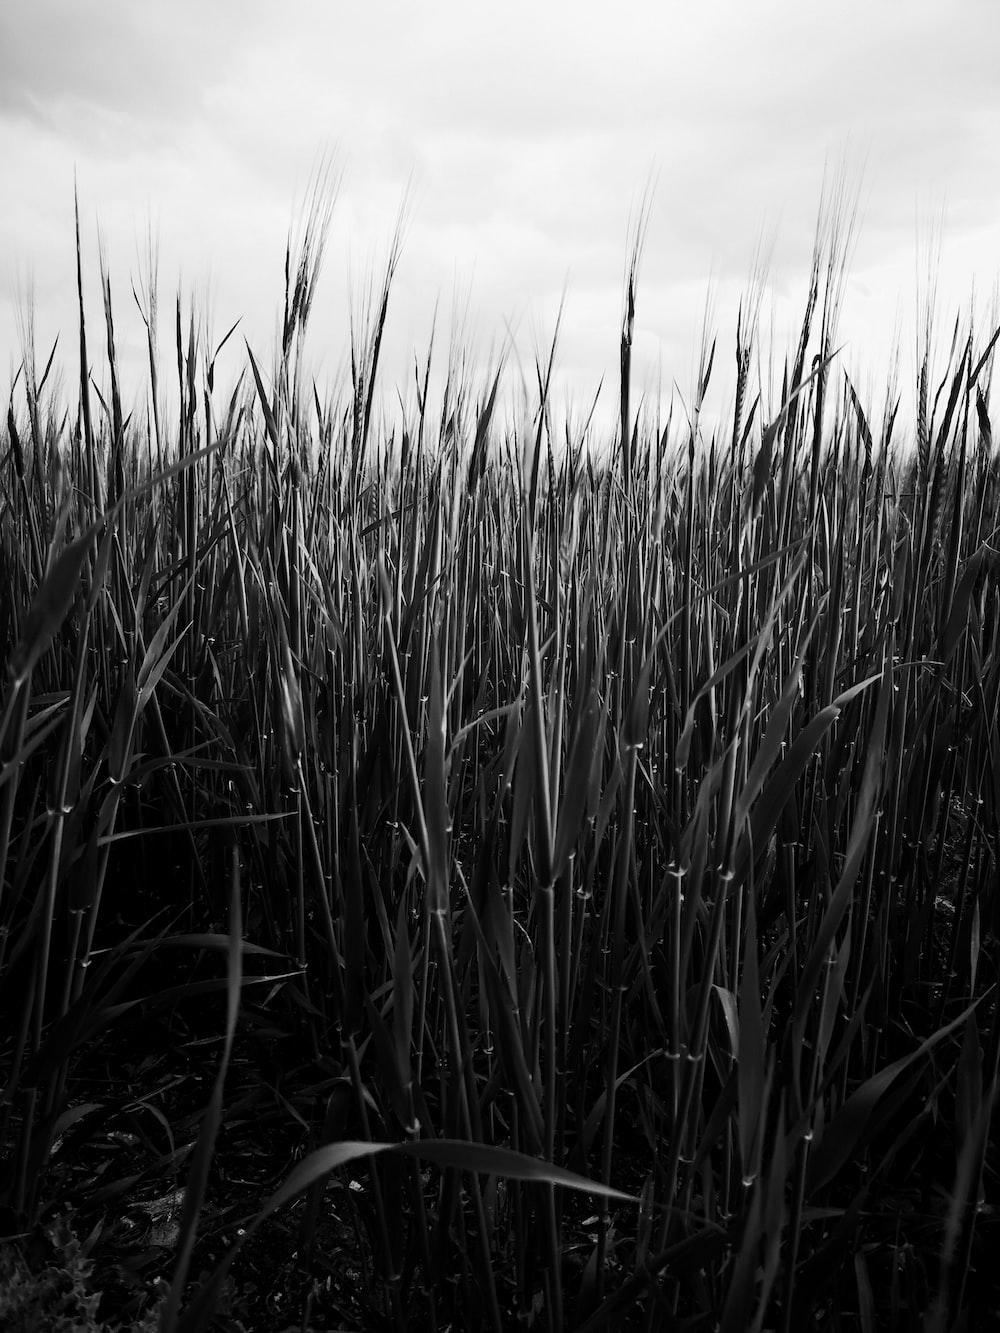 grayscale photo of grass field